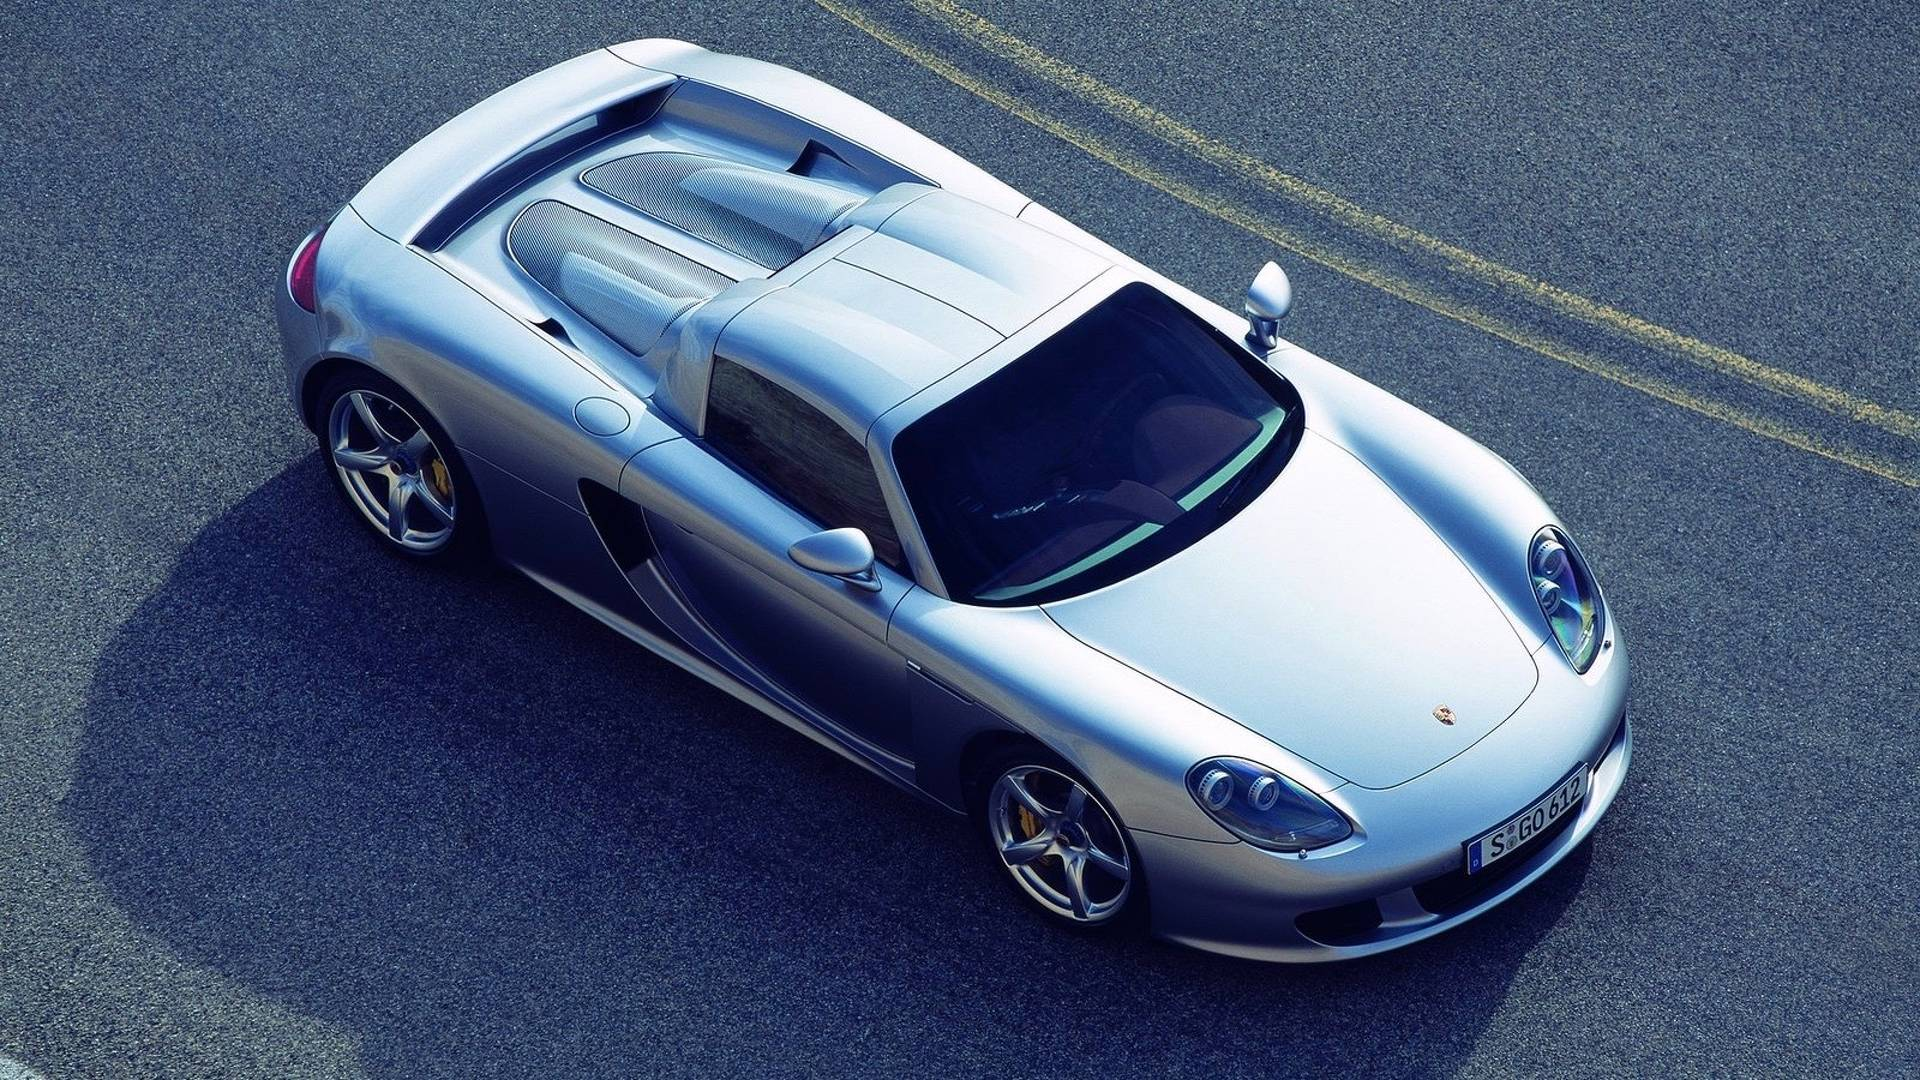 Motor1.com Legends 2004 Porsche Carrera GT